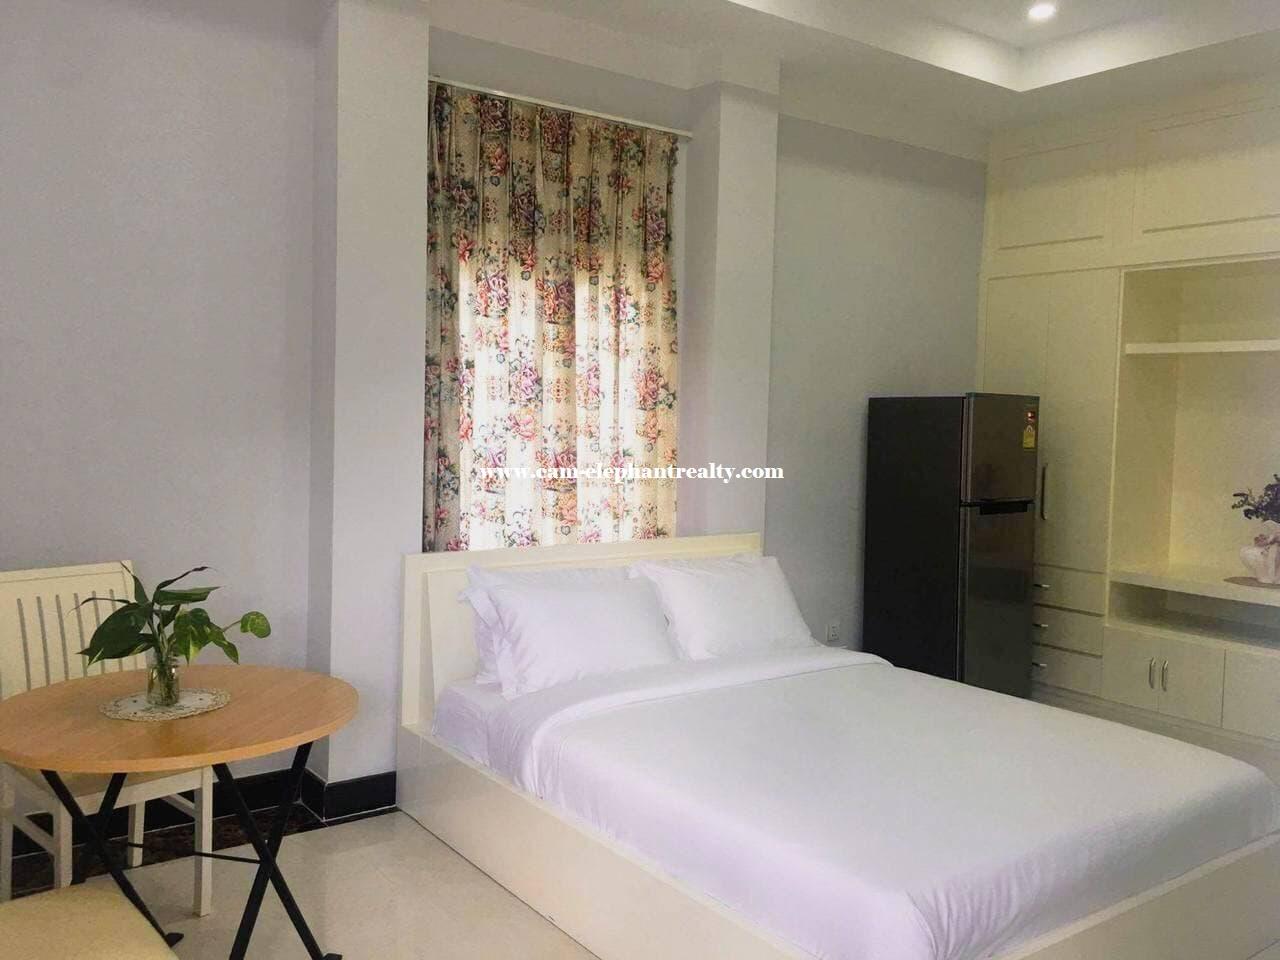 StudioRoom for Rent at Sen Sok area